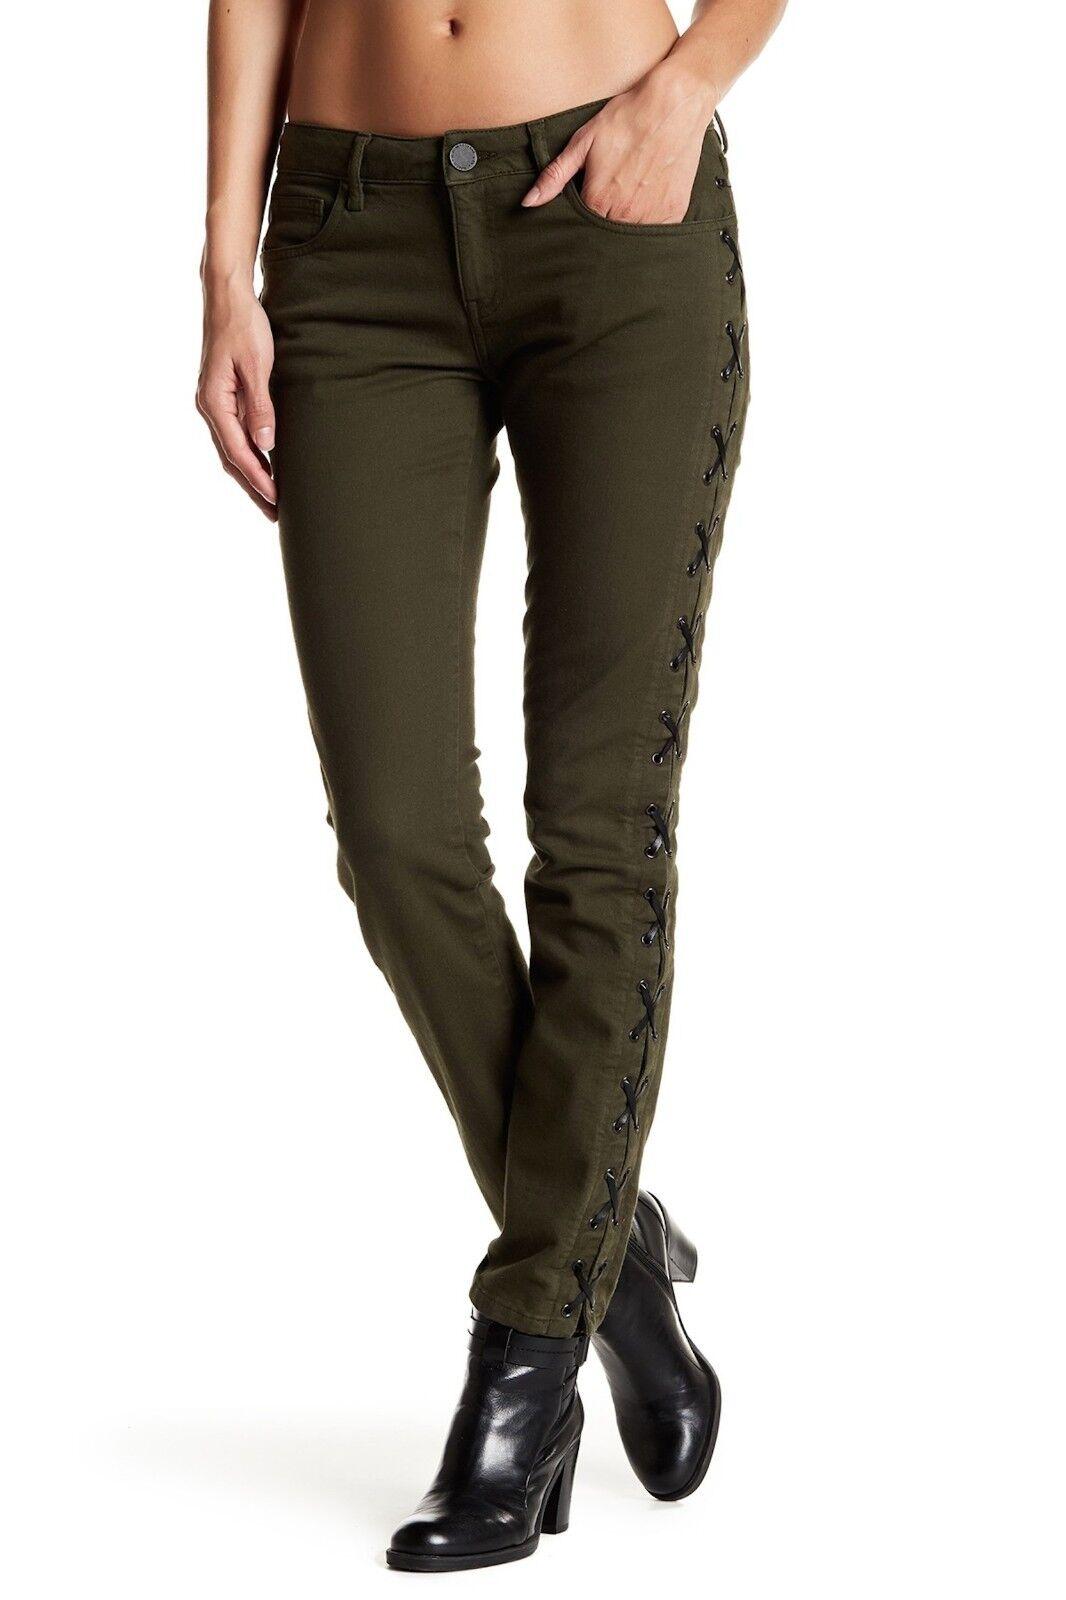 Etienne Marcel Lace-Up Skinny Jean Military Green Denim Sz 28  218 NWT EM7374